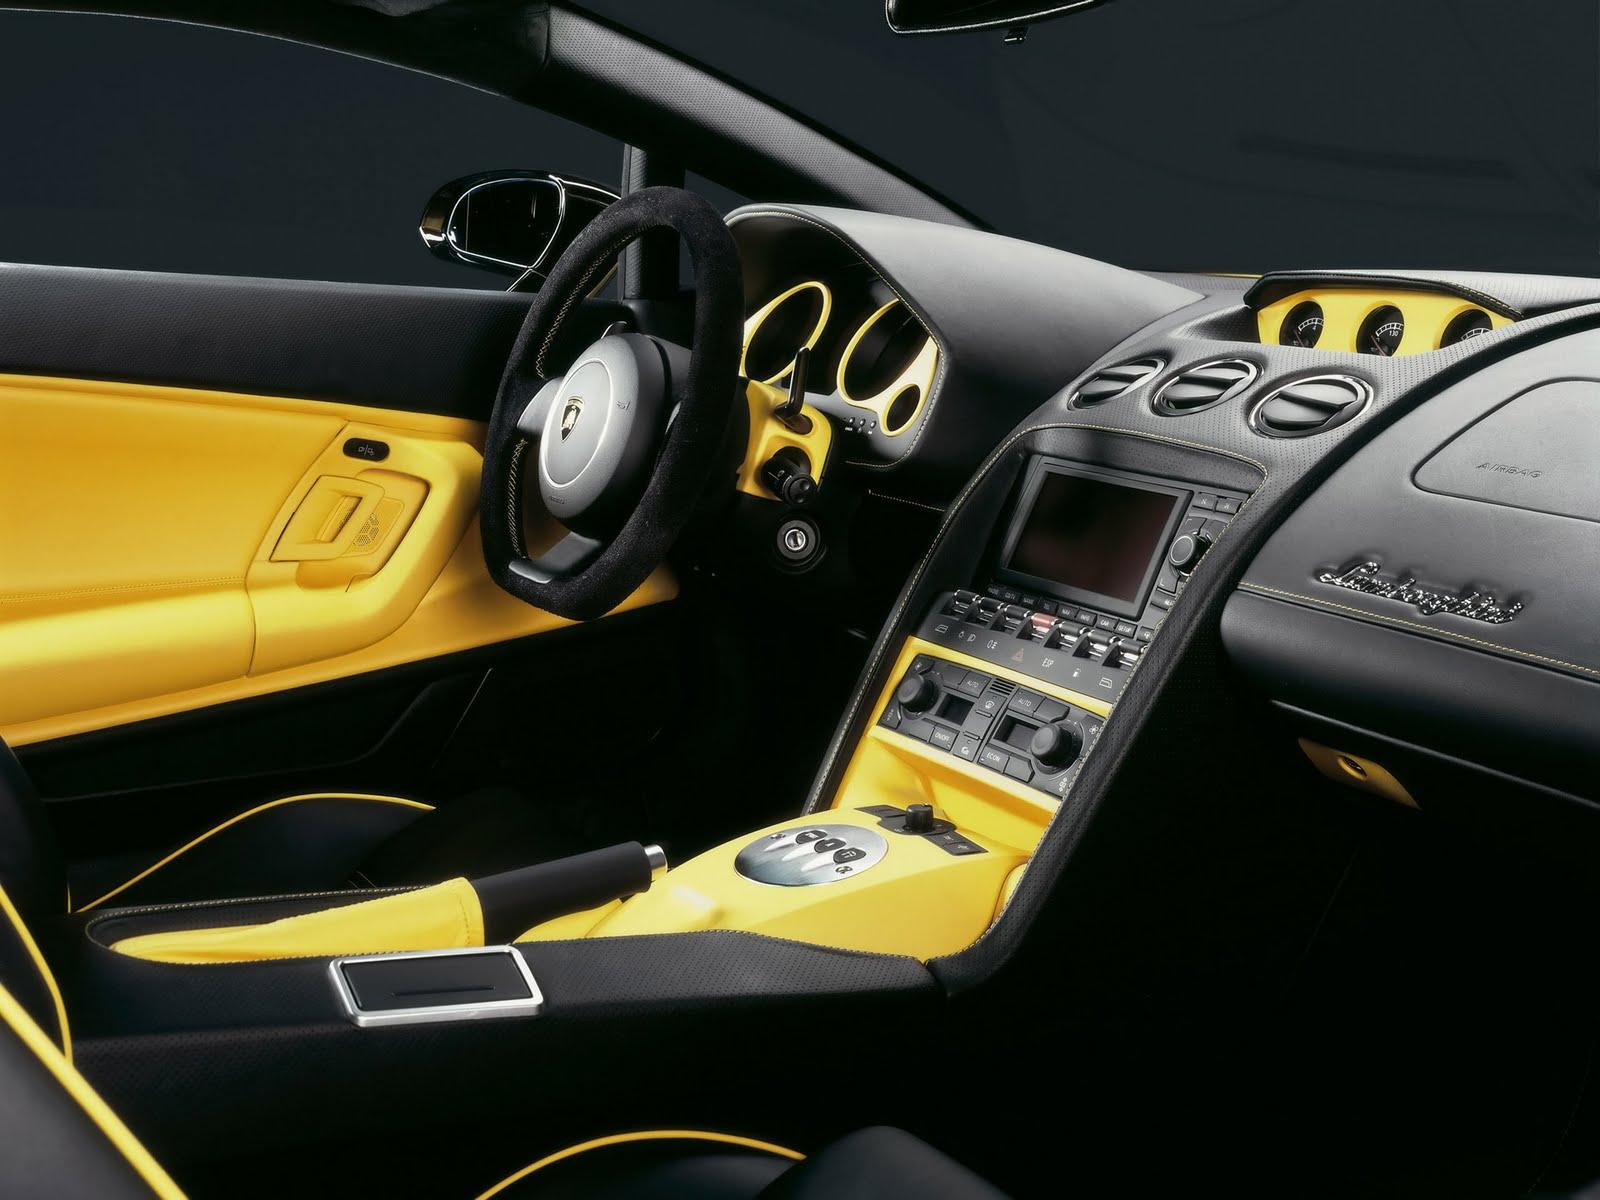 http://4.bp.blogspot.com/_ddEtvpt28yA/TUEjer56veI/AAAAAAAABps/aU4cuNr8hc8/s1600/Lamborghini%2BGallardo%2B8.jpg